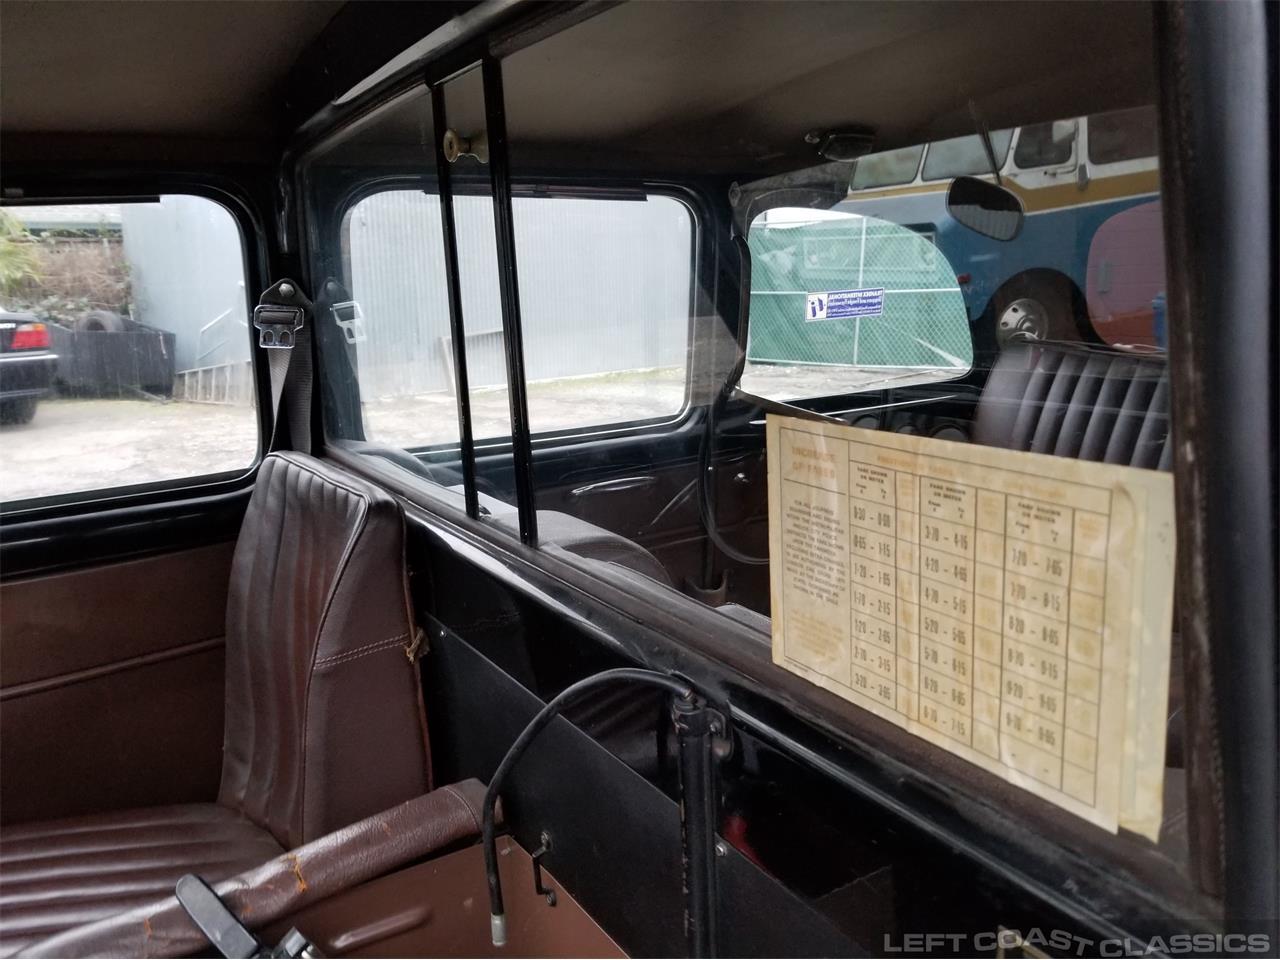 Large Picture of Classic '67 Austin FX4 Taxi Cab - $12,500.00 - PKBX